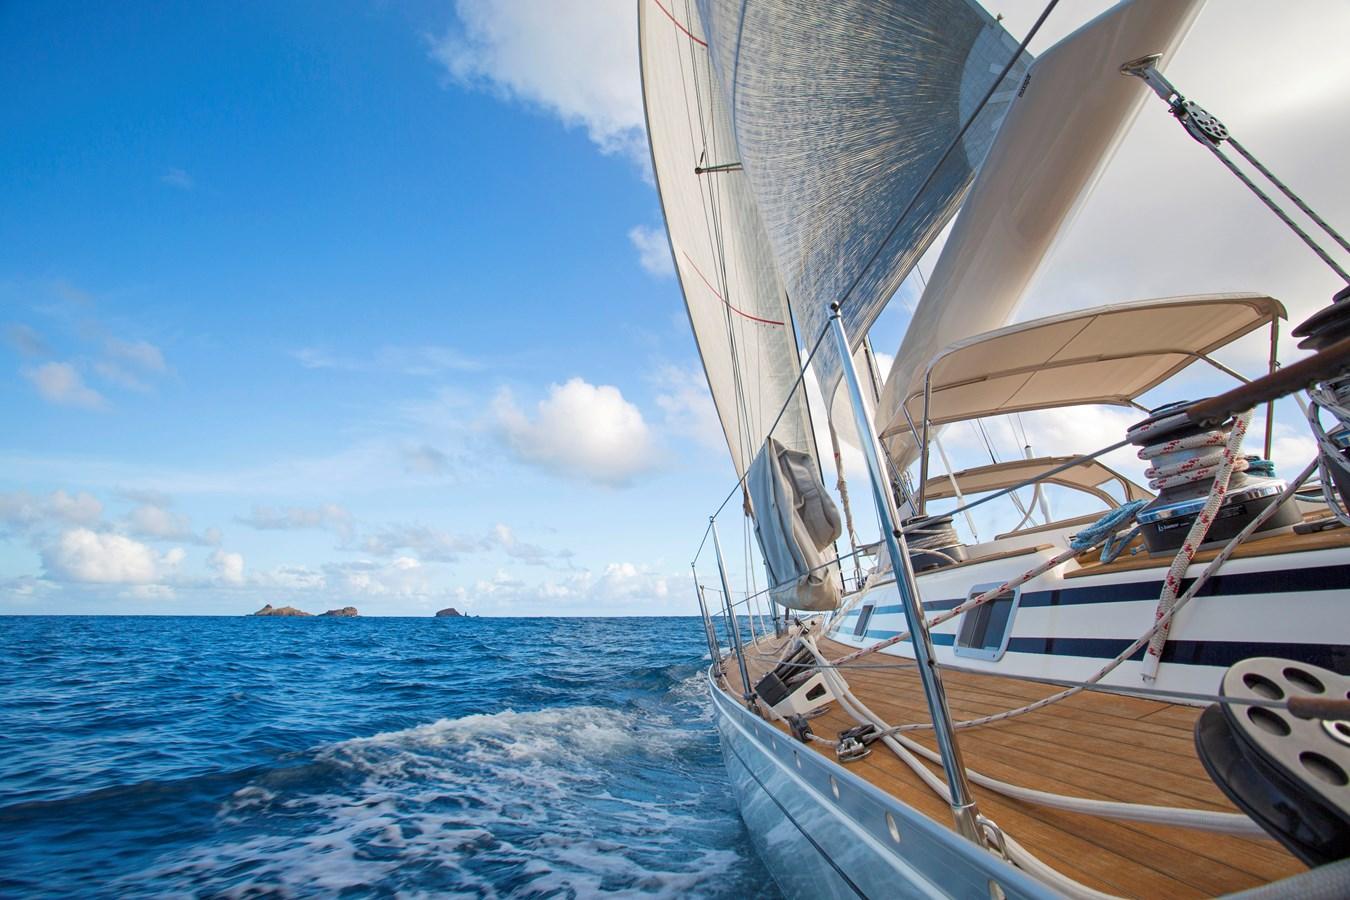 121314BTSC-1101 3 SWAN SWAN 68 Cruising Sailboat 2586756